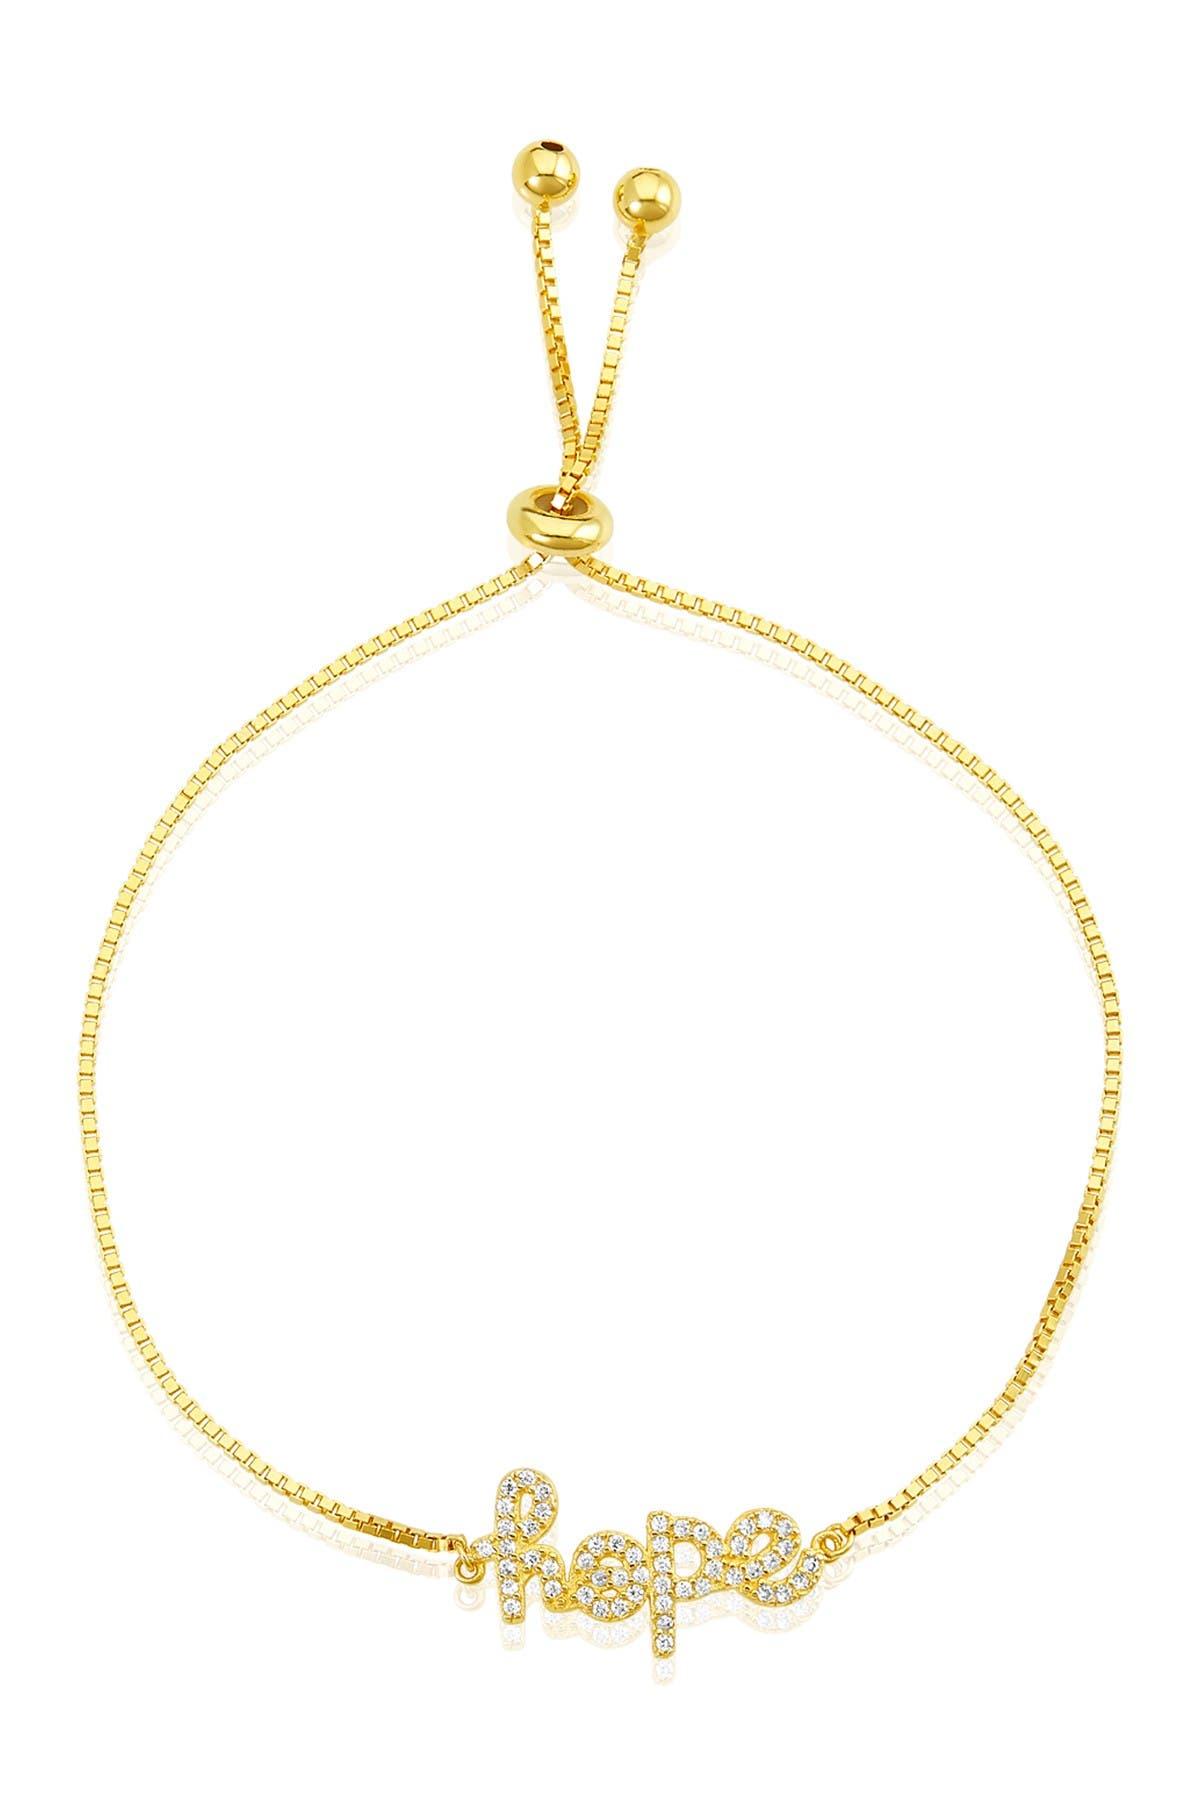 Image of ADORNIA 14K Gold Vermeil Hope Bolo Bracelet